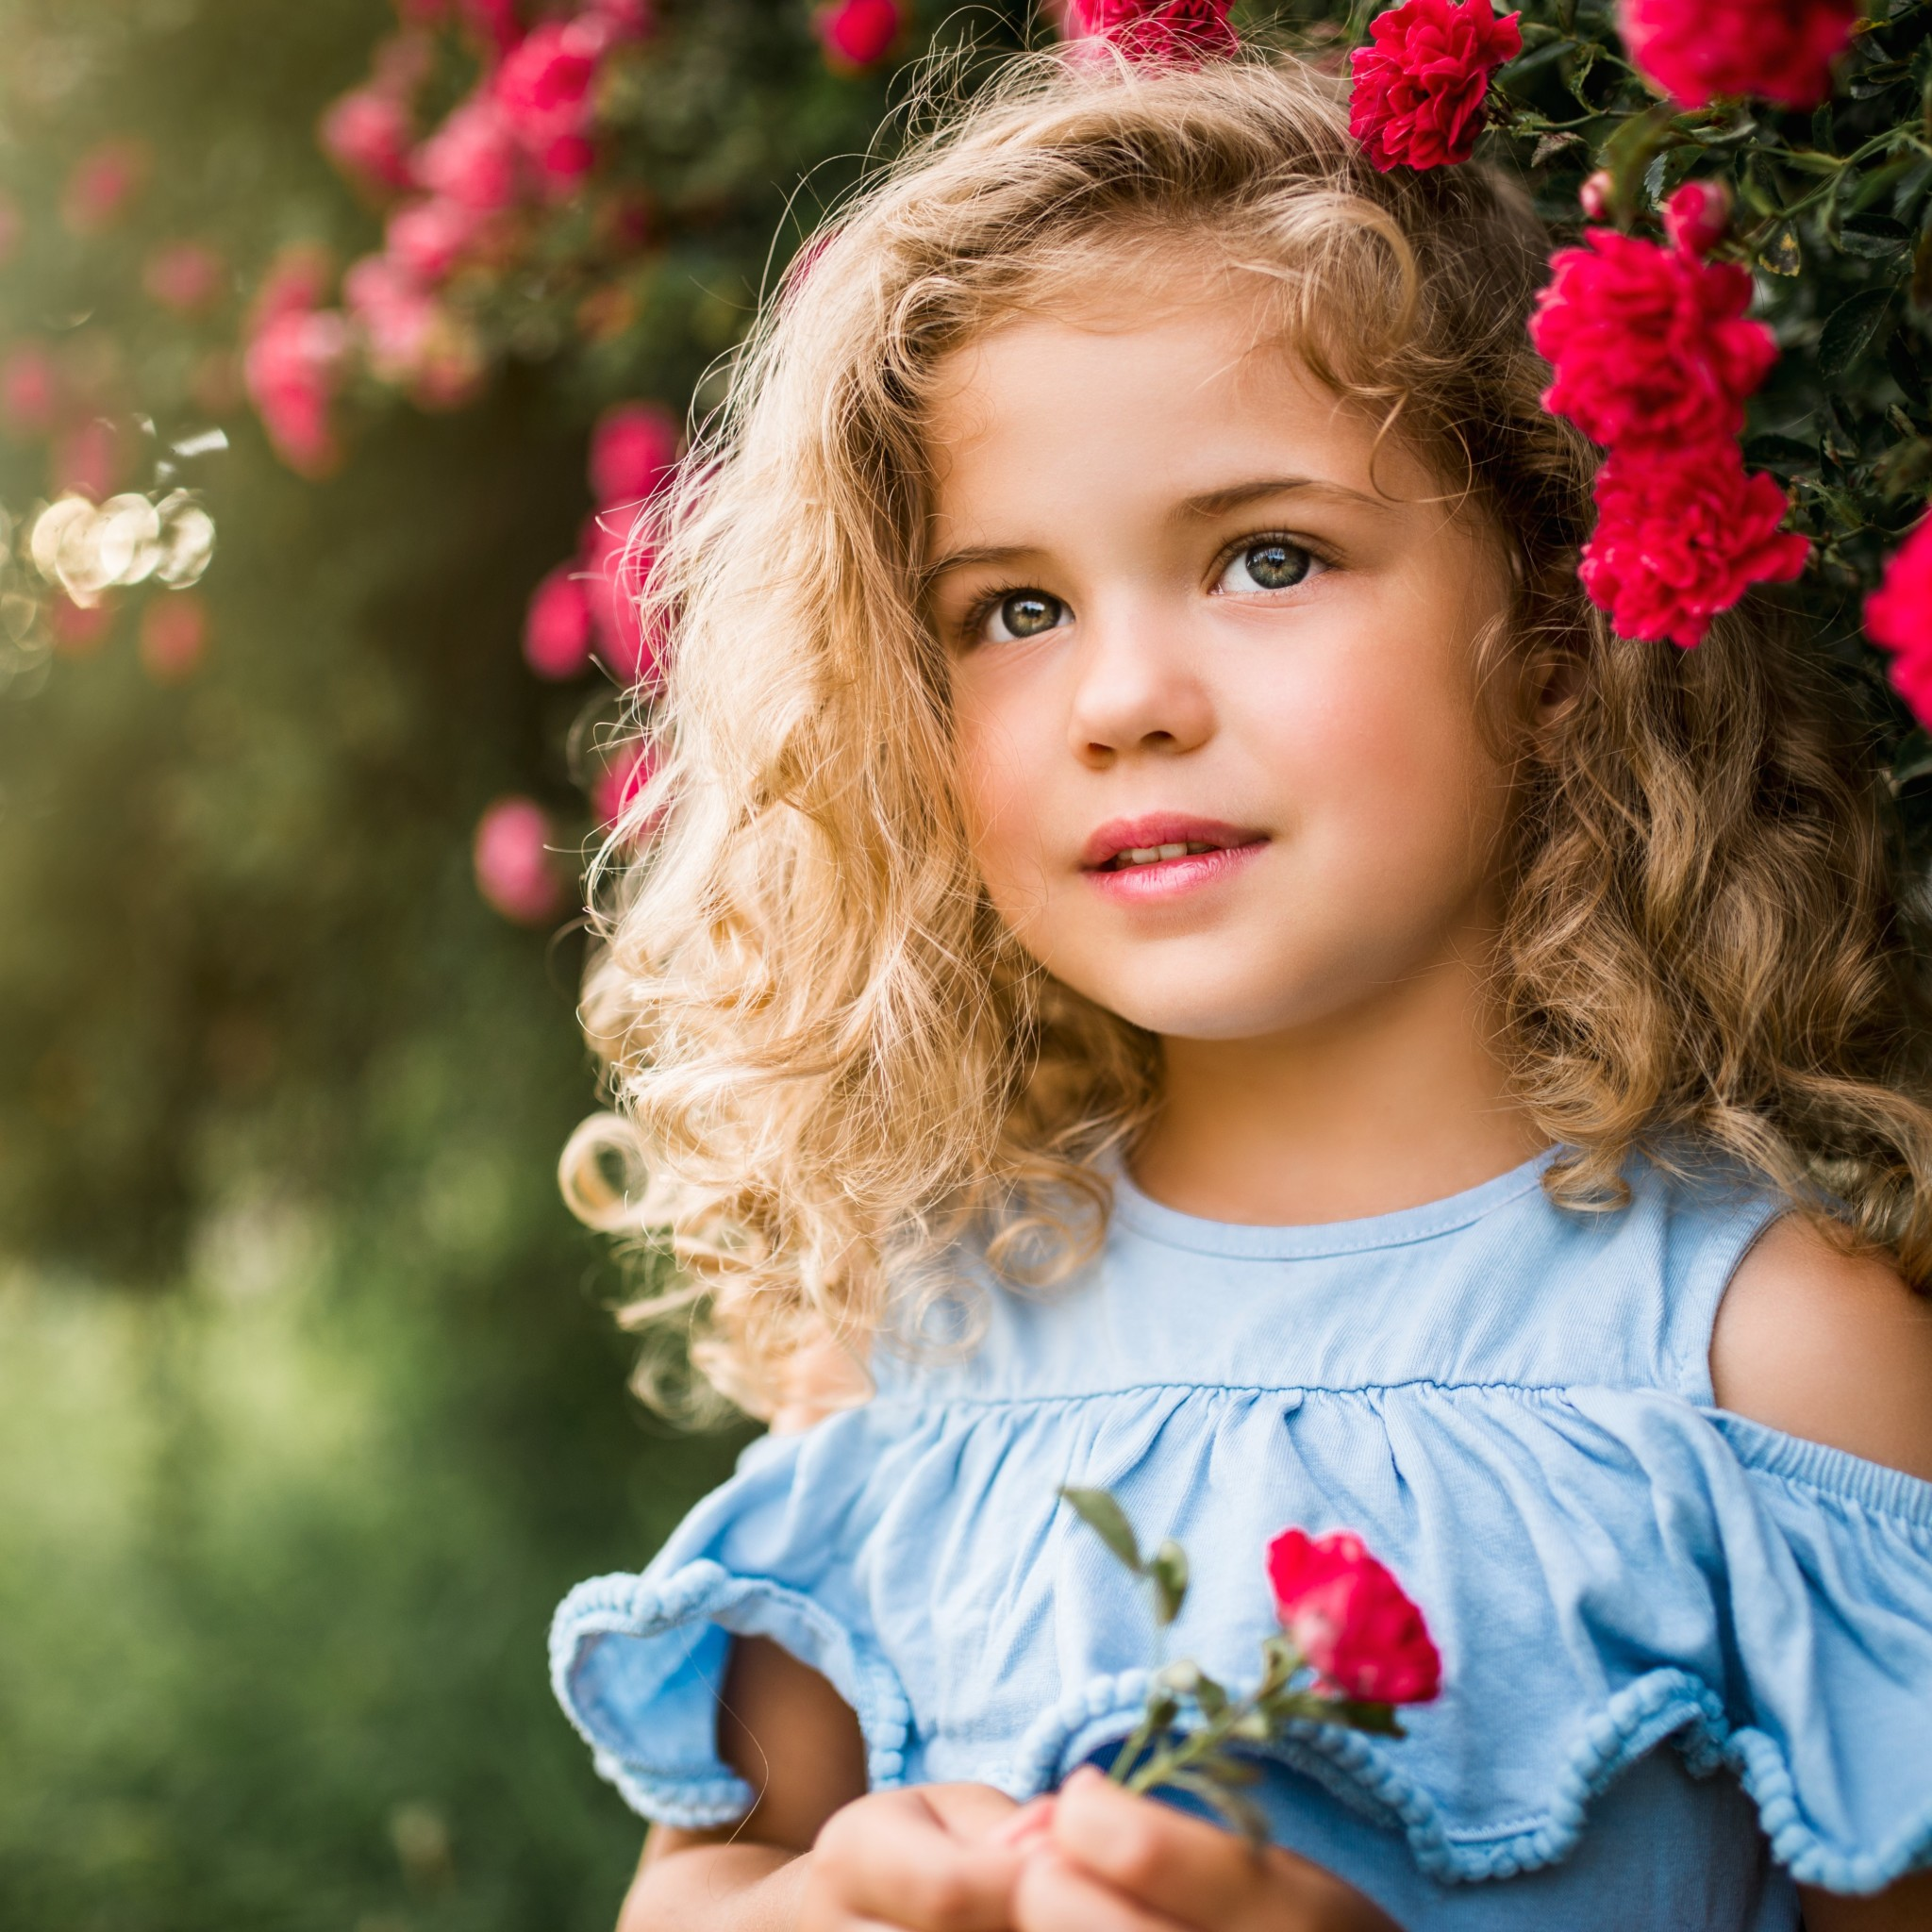 Detské portrétne fotografie